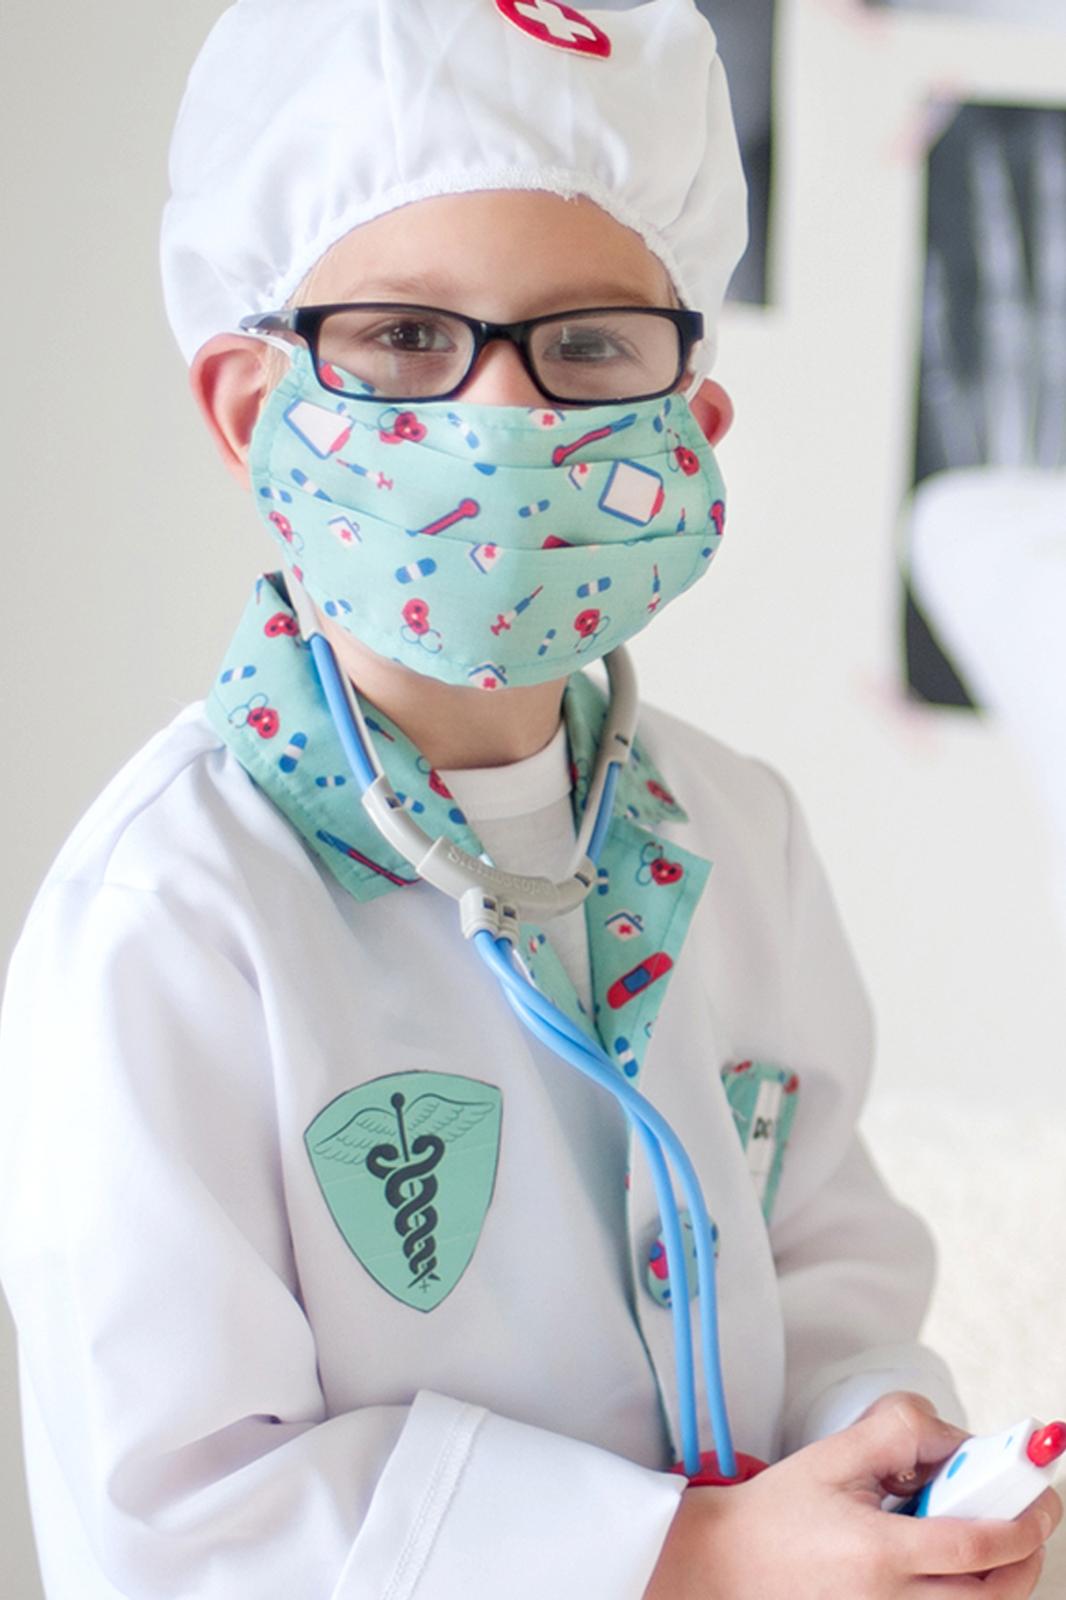 Doctor Nurse Surgeon Stethoscope Costume Accessory New